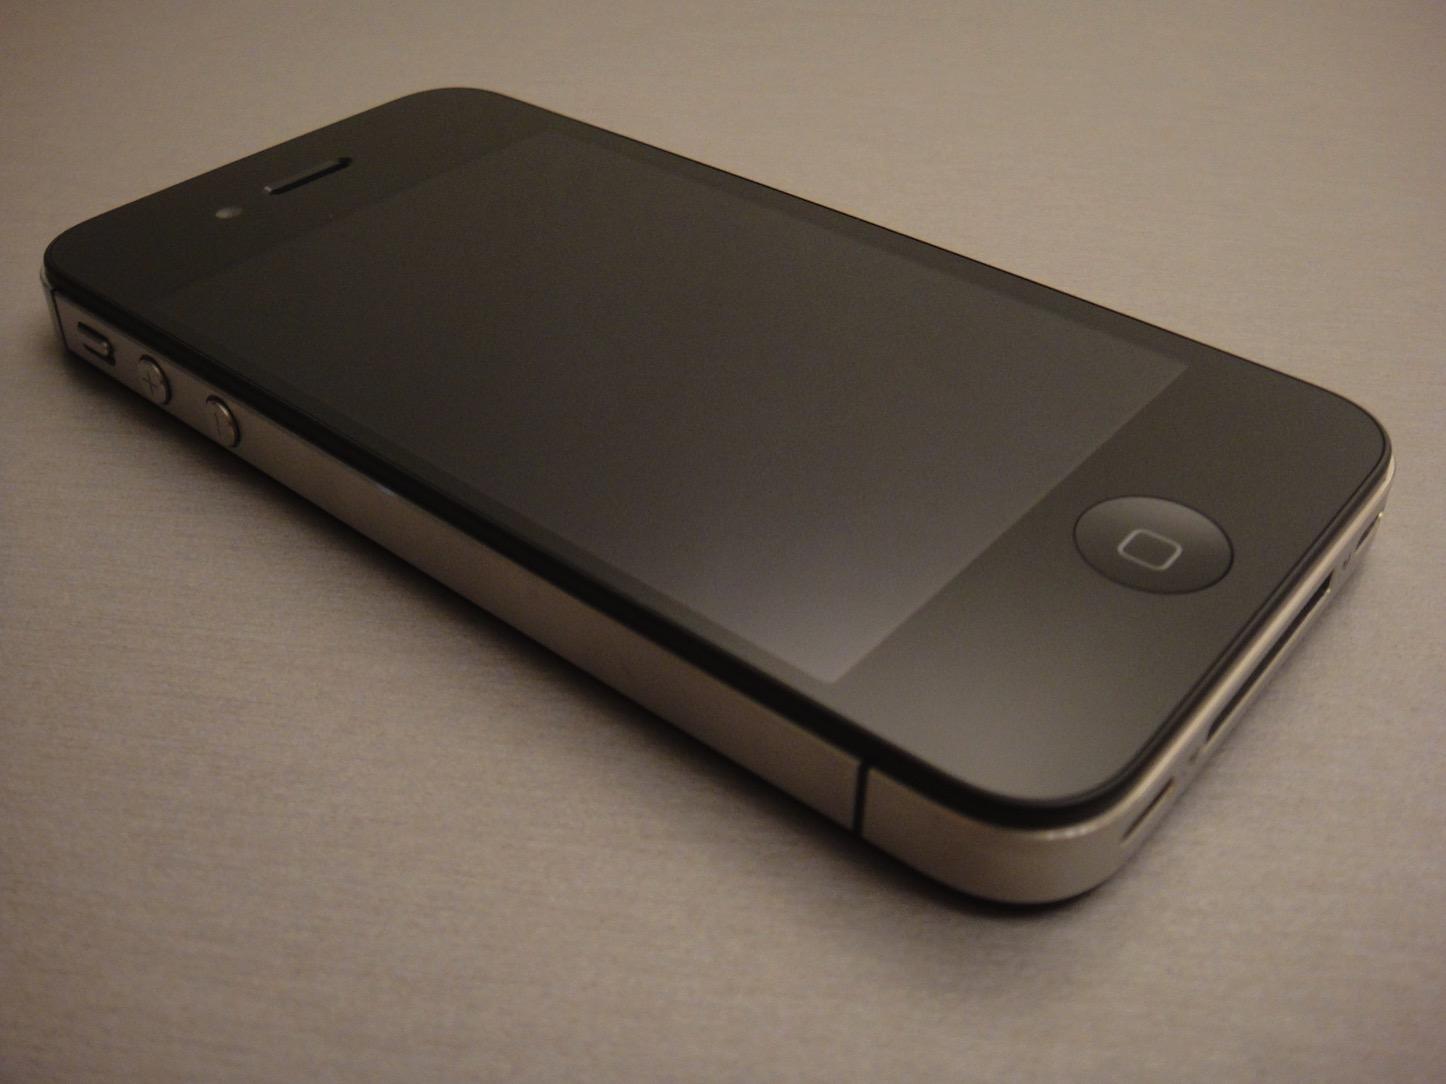 iphone-4s-photo.jpg